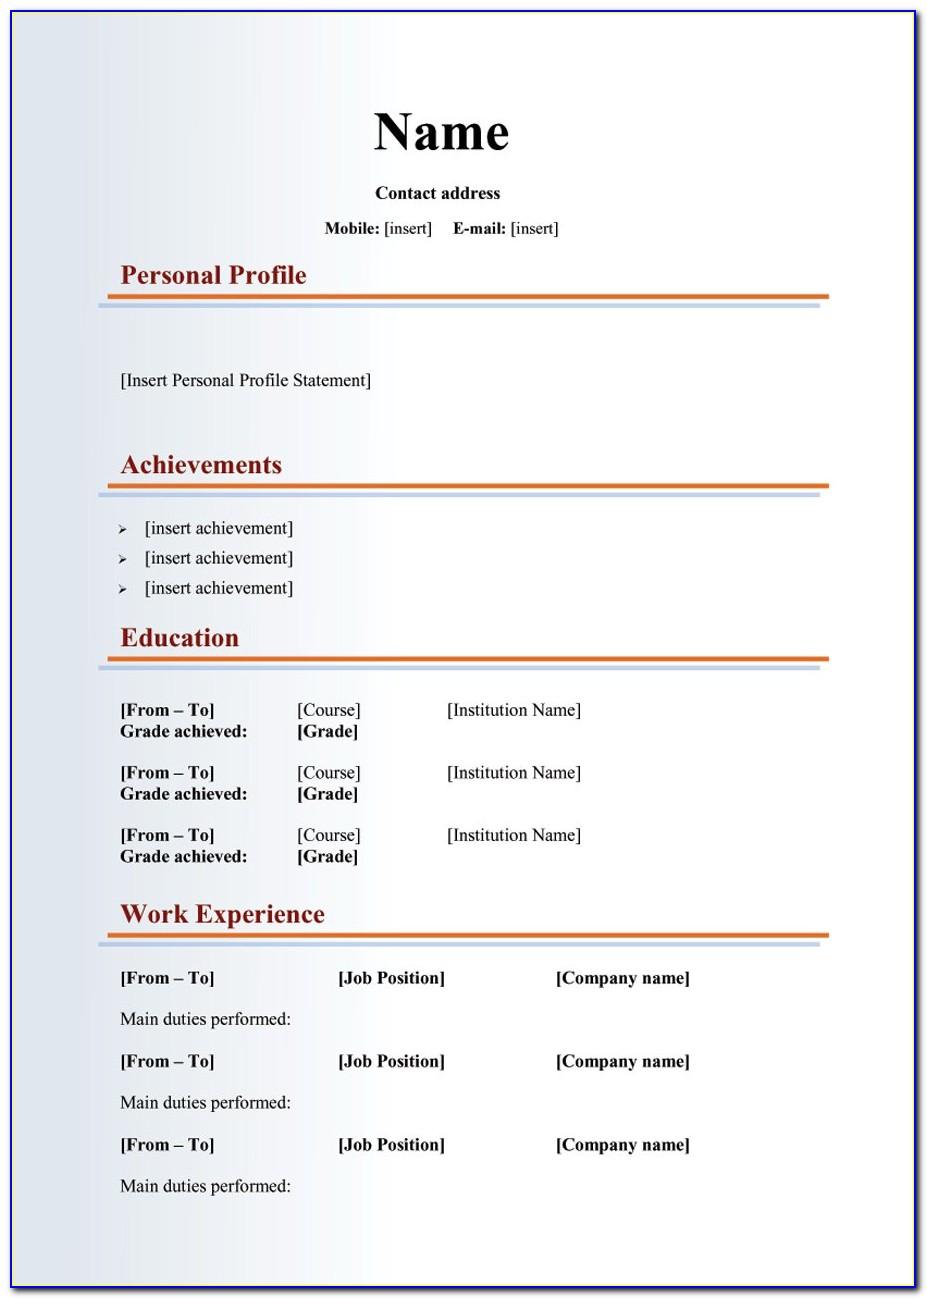 Microsoft Curriculum Vitae (cv) Templates Free Download